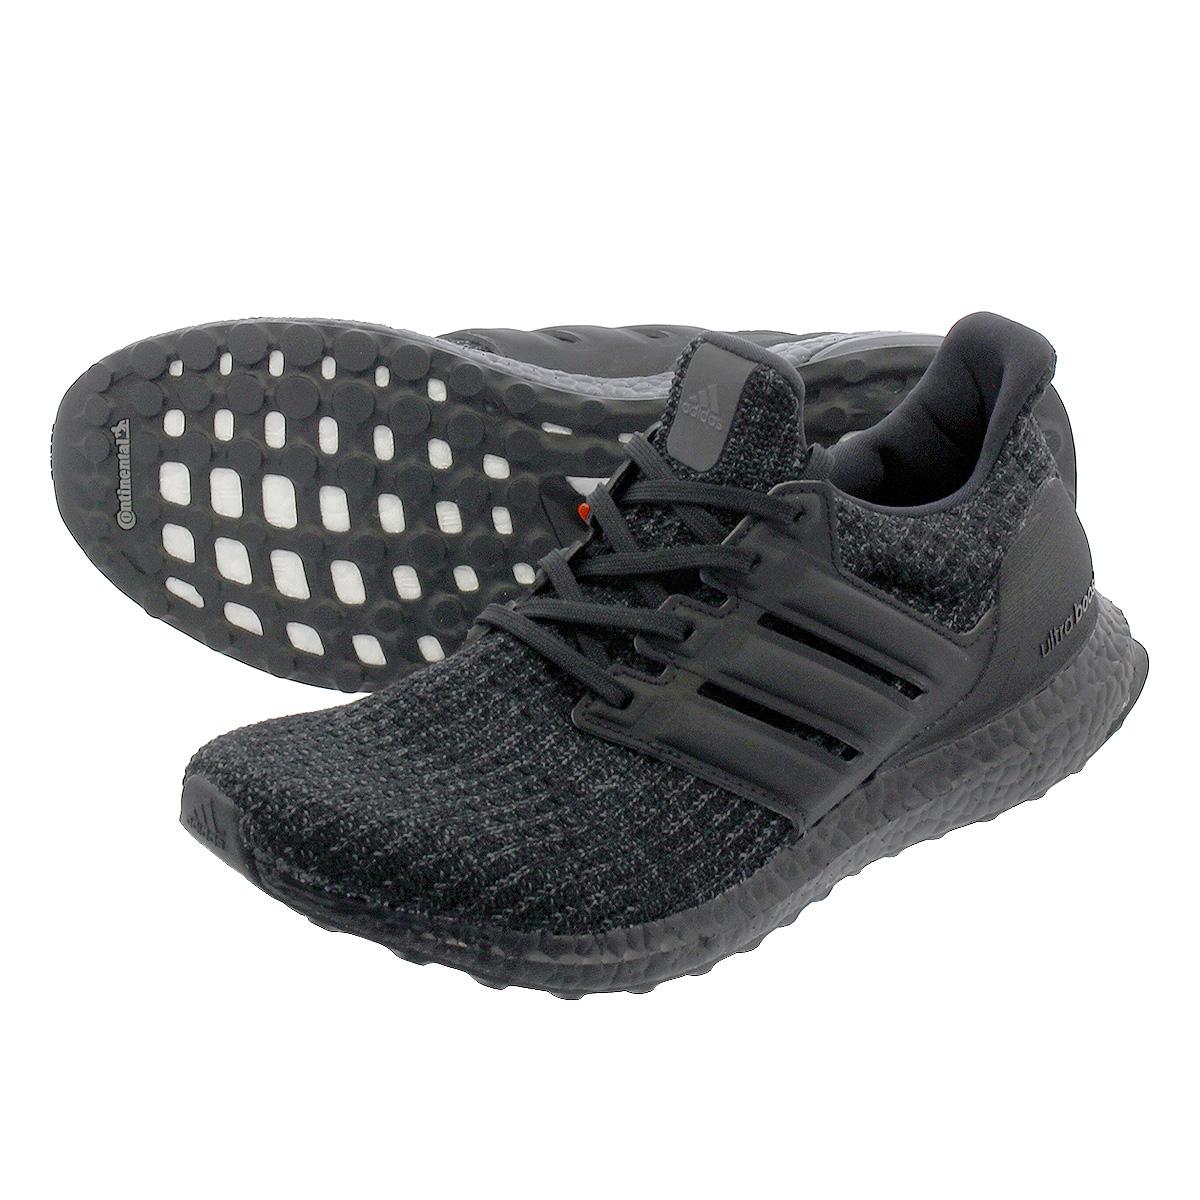 adidas ULTRA BOOST Adidas ultra boost CORE BLACKCORE BLACKRED f36641